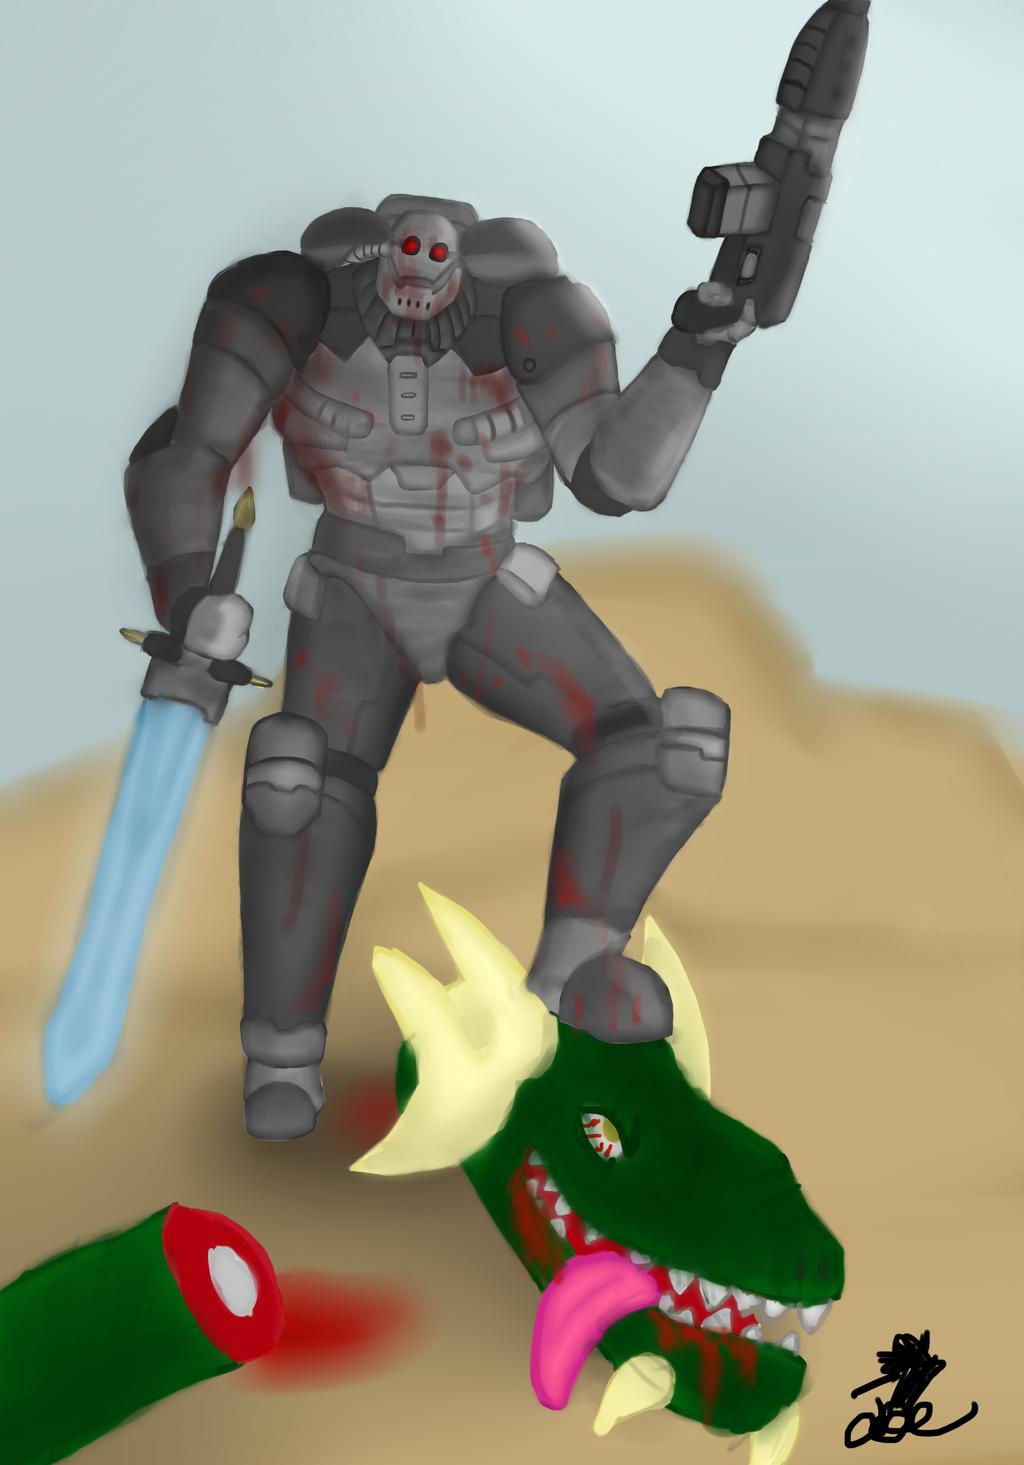 Harval, the Bounty Slayer by ChromeFlames